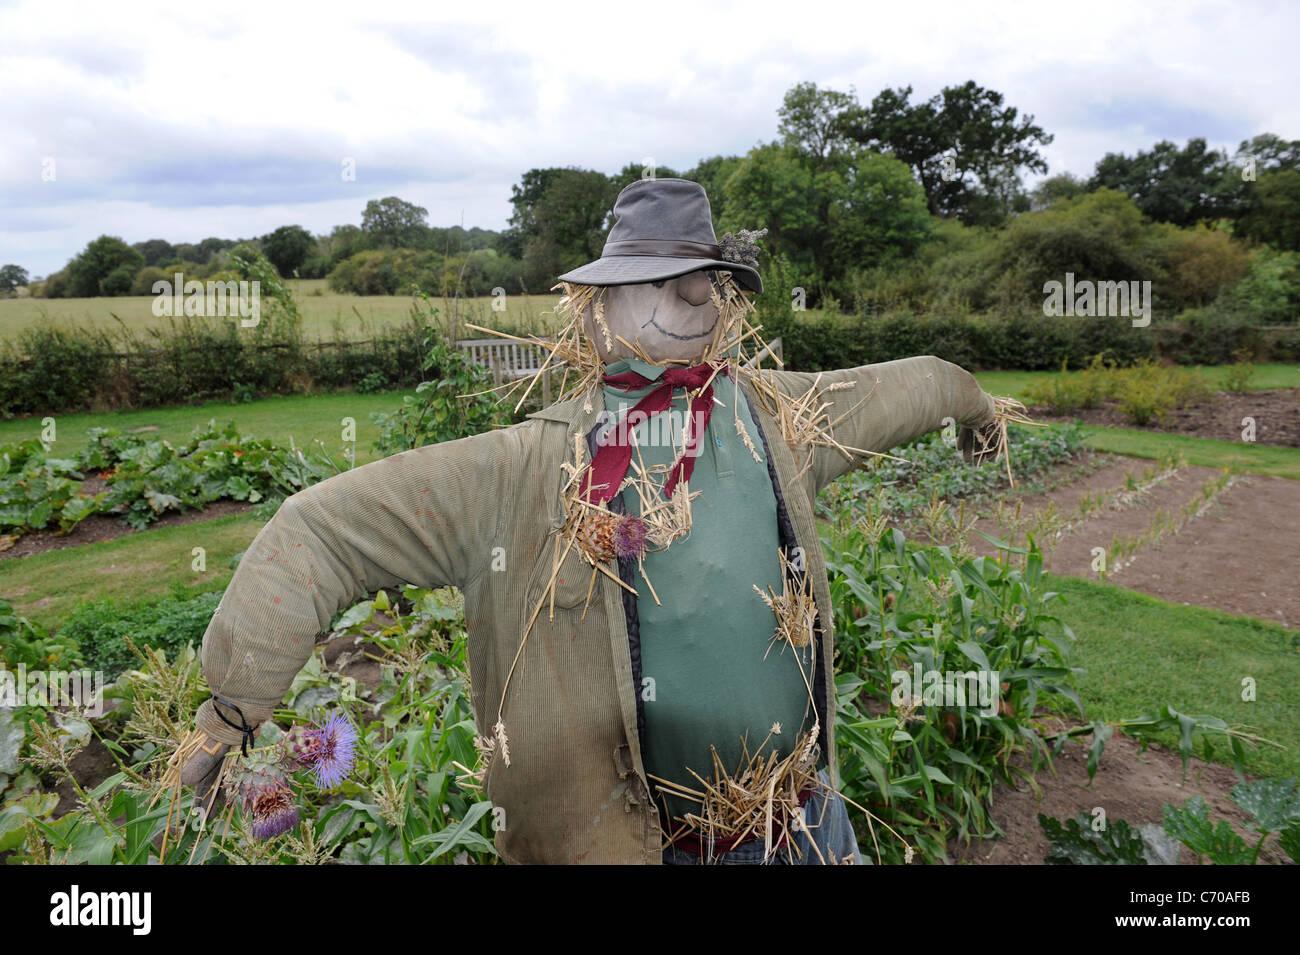 Garden scarecrow England Uk - Stock Image